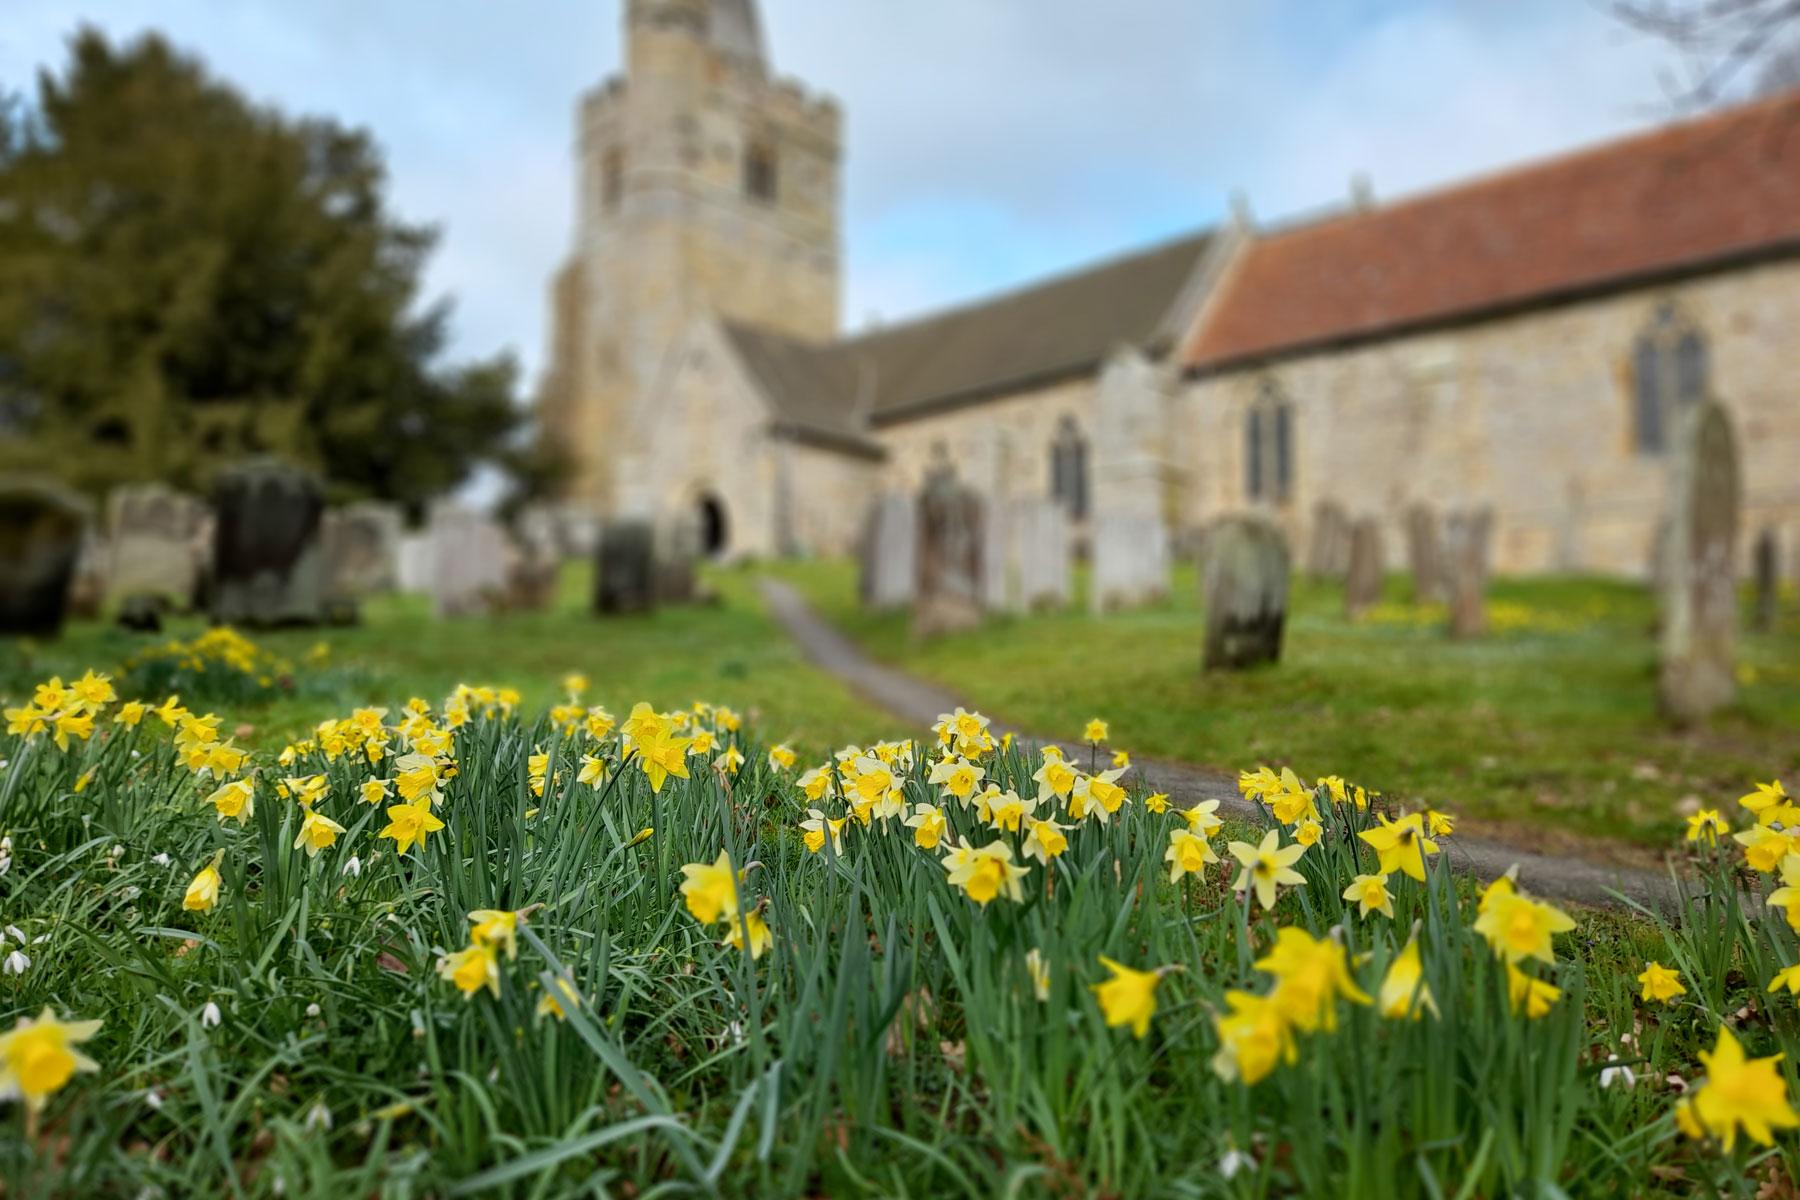 Daffodils in Lamberhurst Churchyard